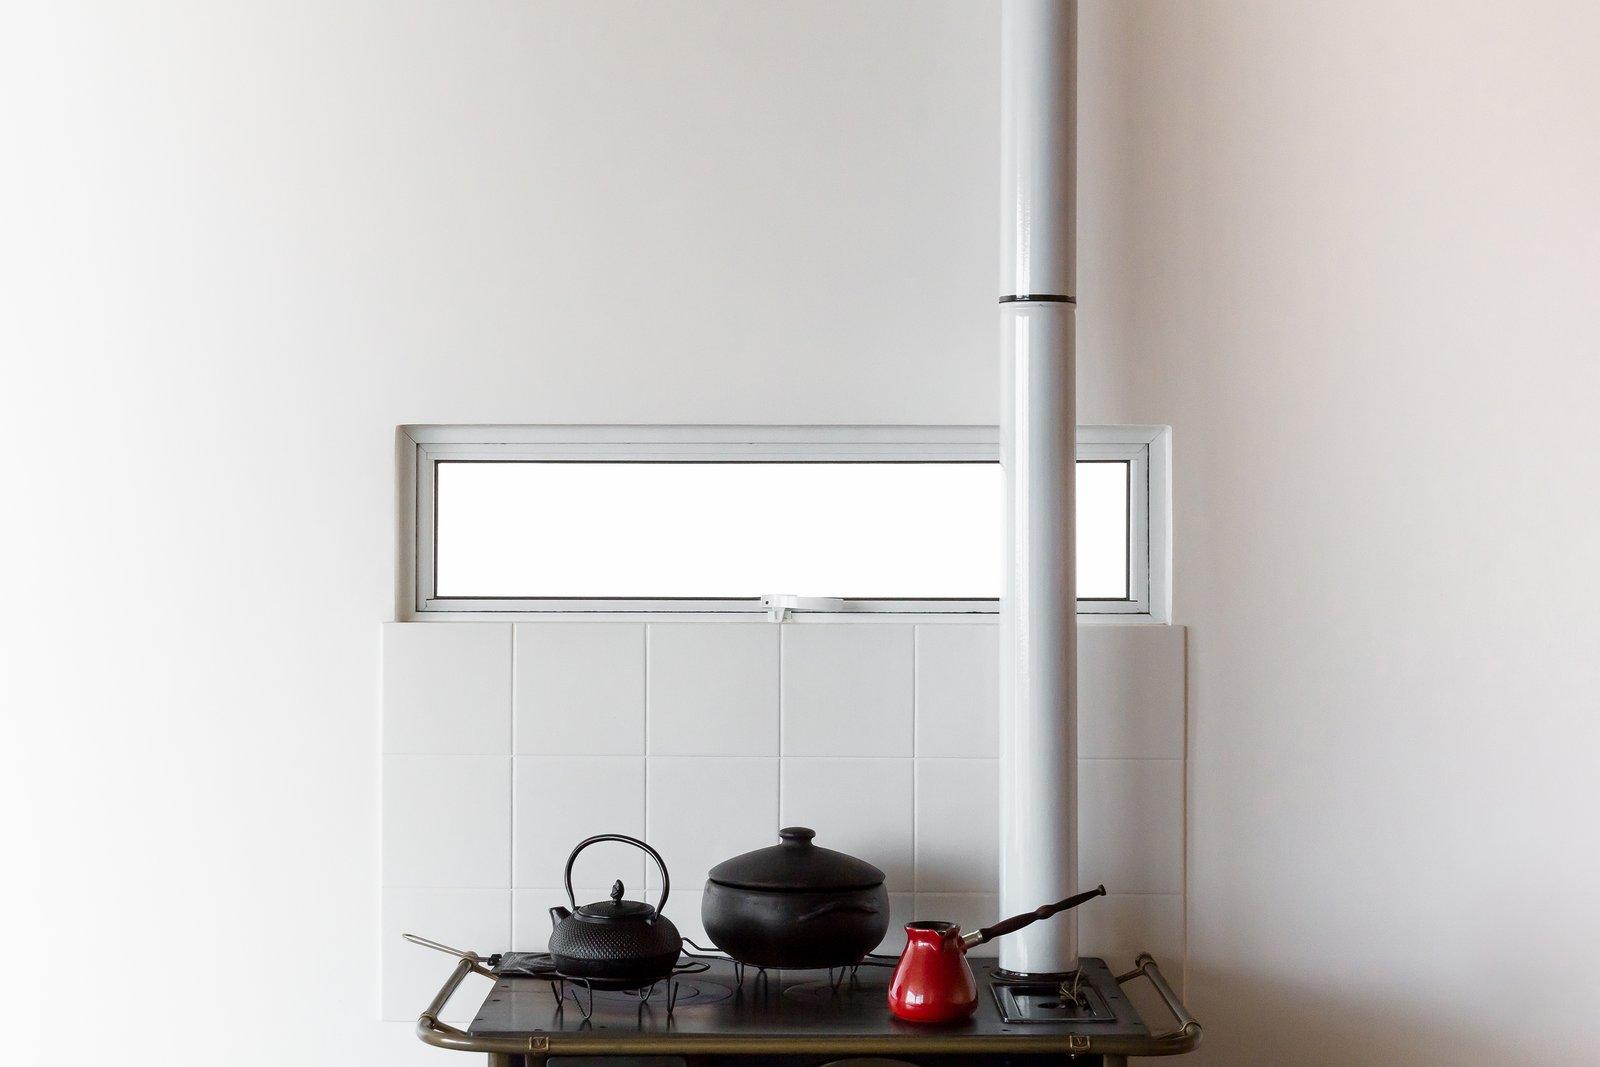 Kitchen and Ceramic Tile Backsplashe  View House by Barbara Becker